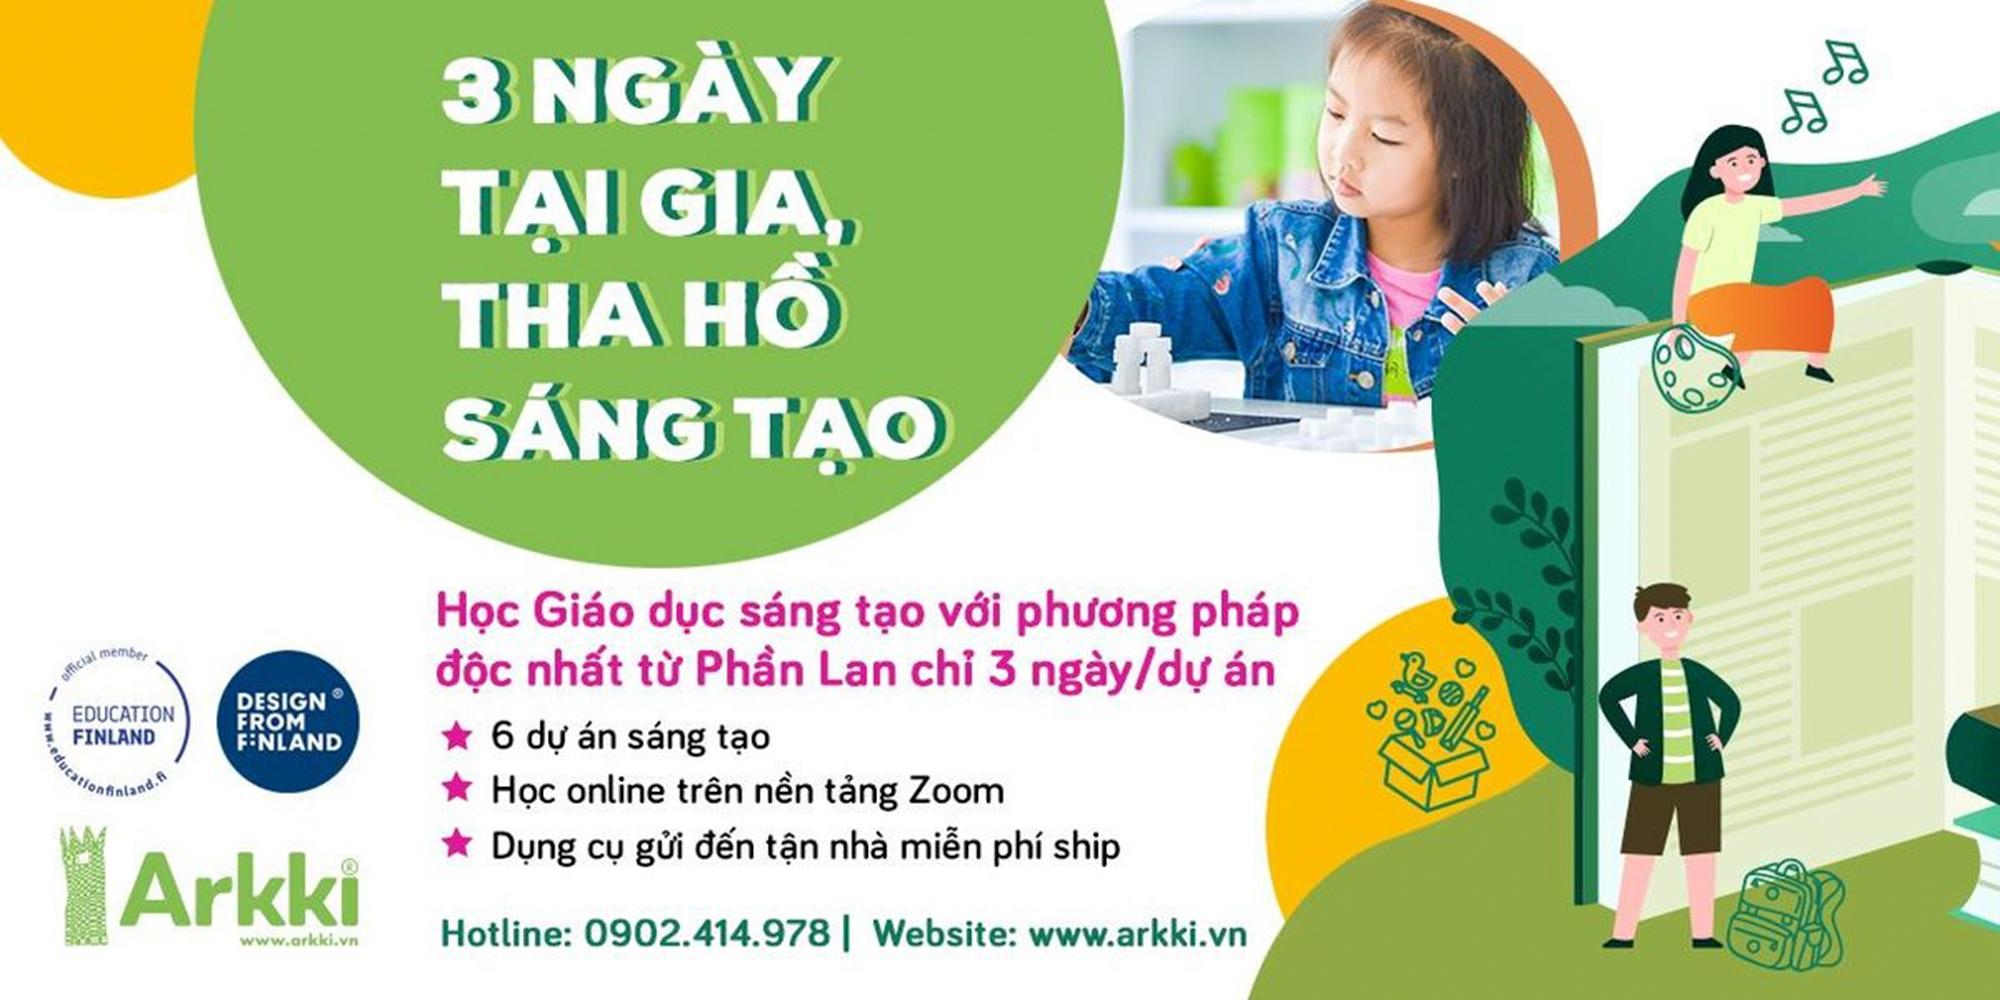 Arkki Việt Nam  (@arkkivn) Cover Image